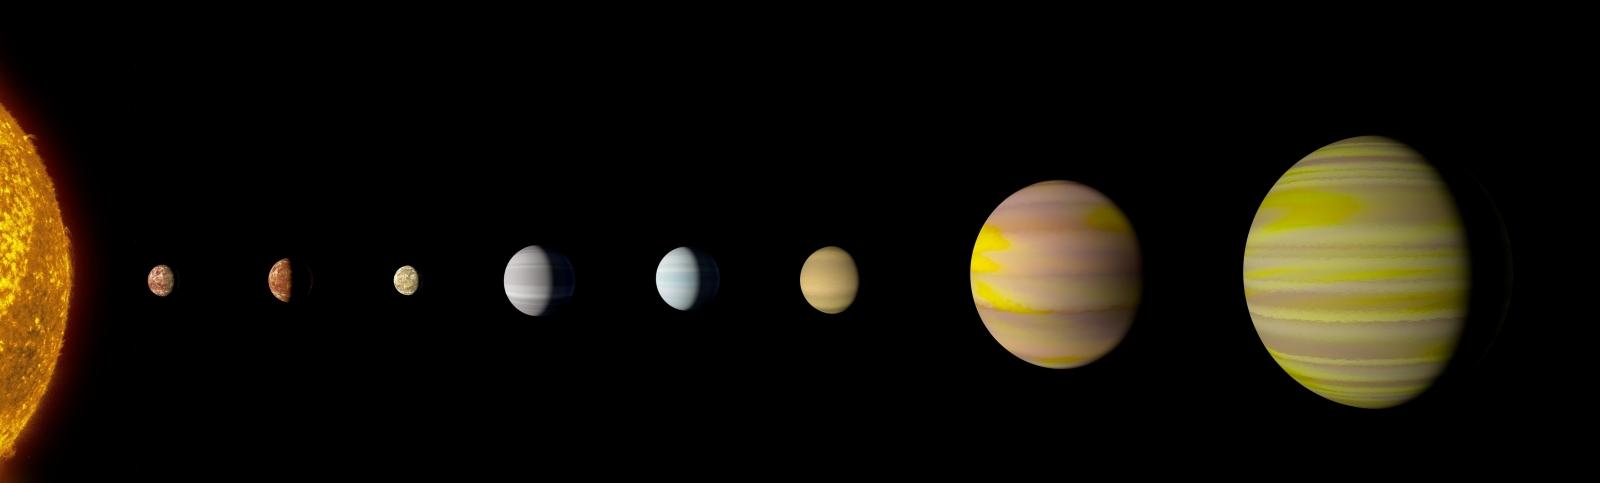 Kepler-90 star system